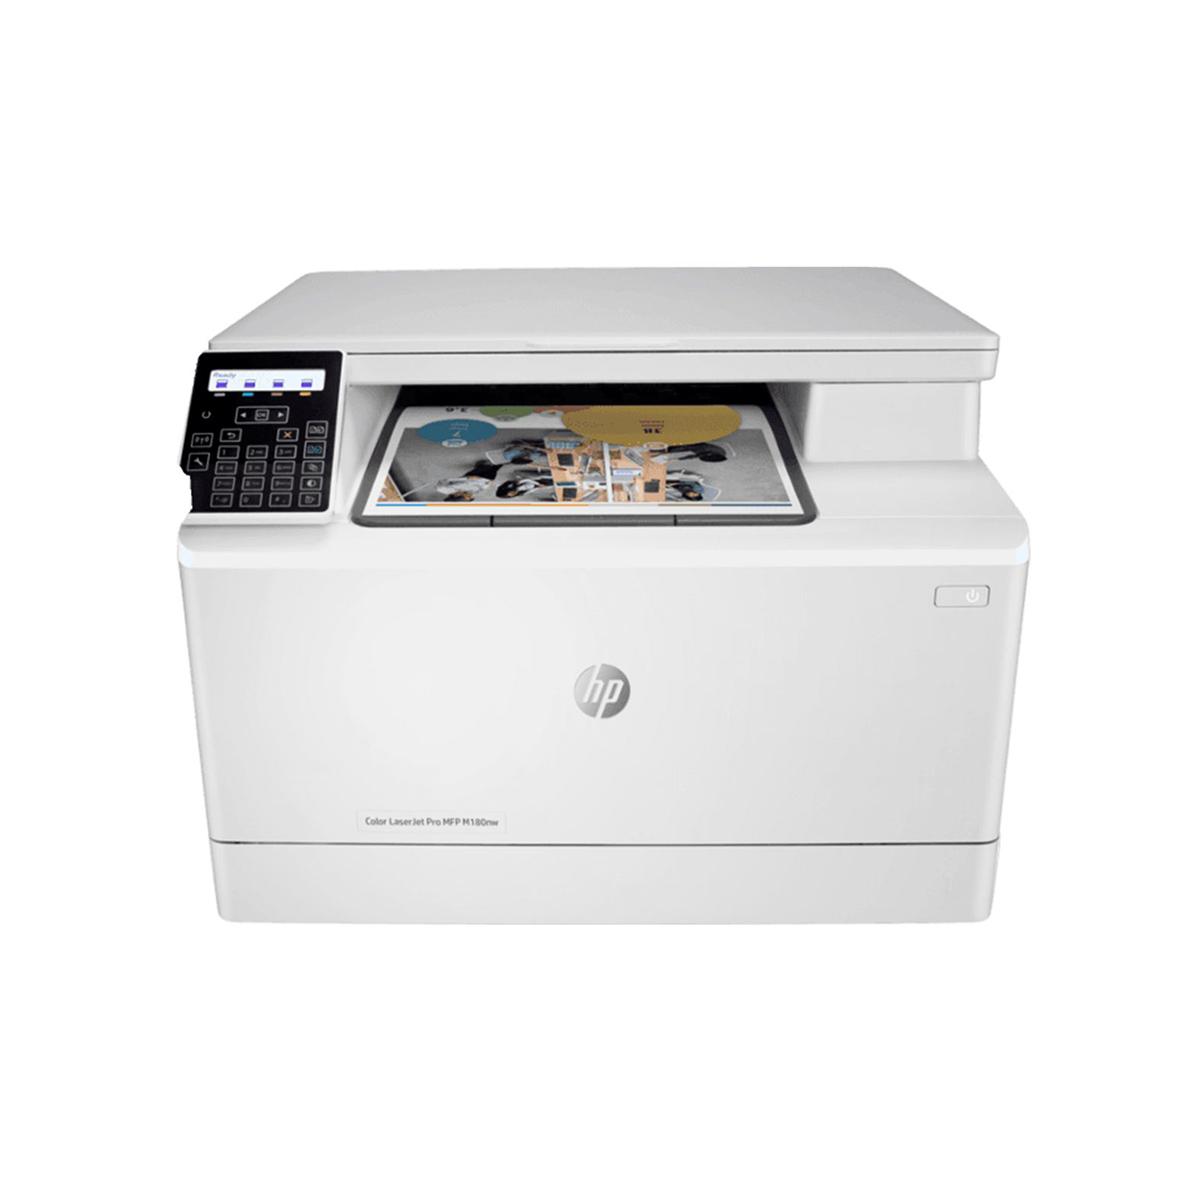 Impresora HP LaserJet Pro M180nw